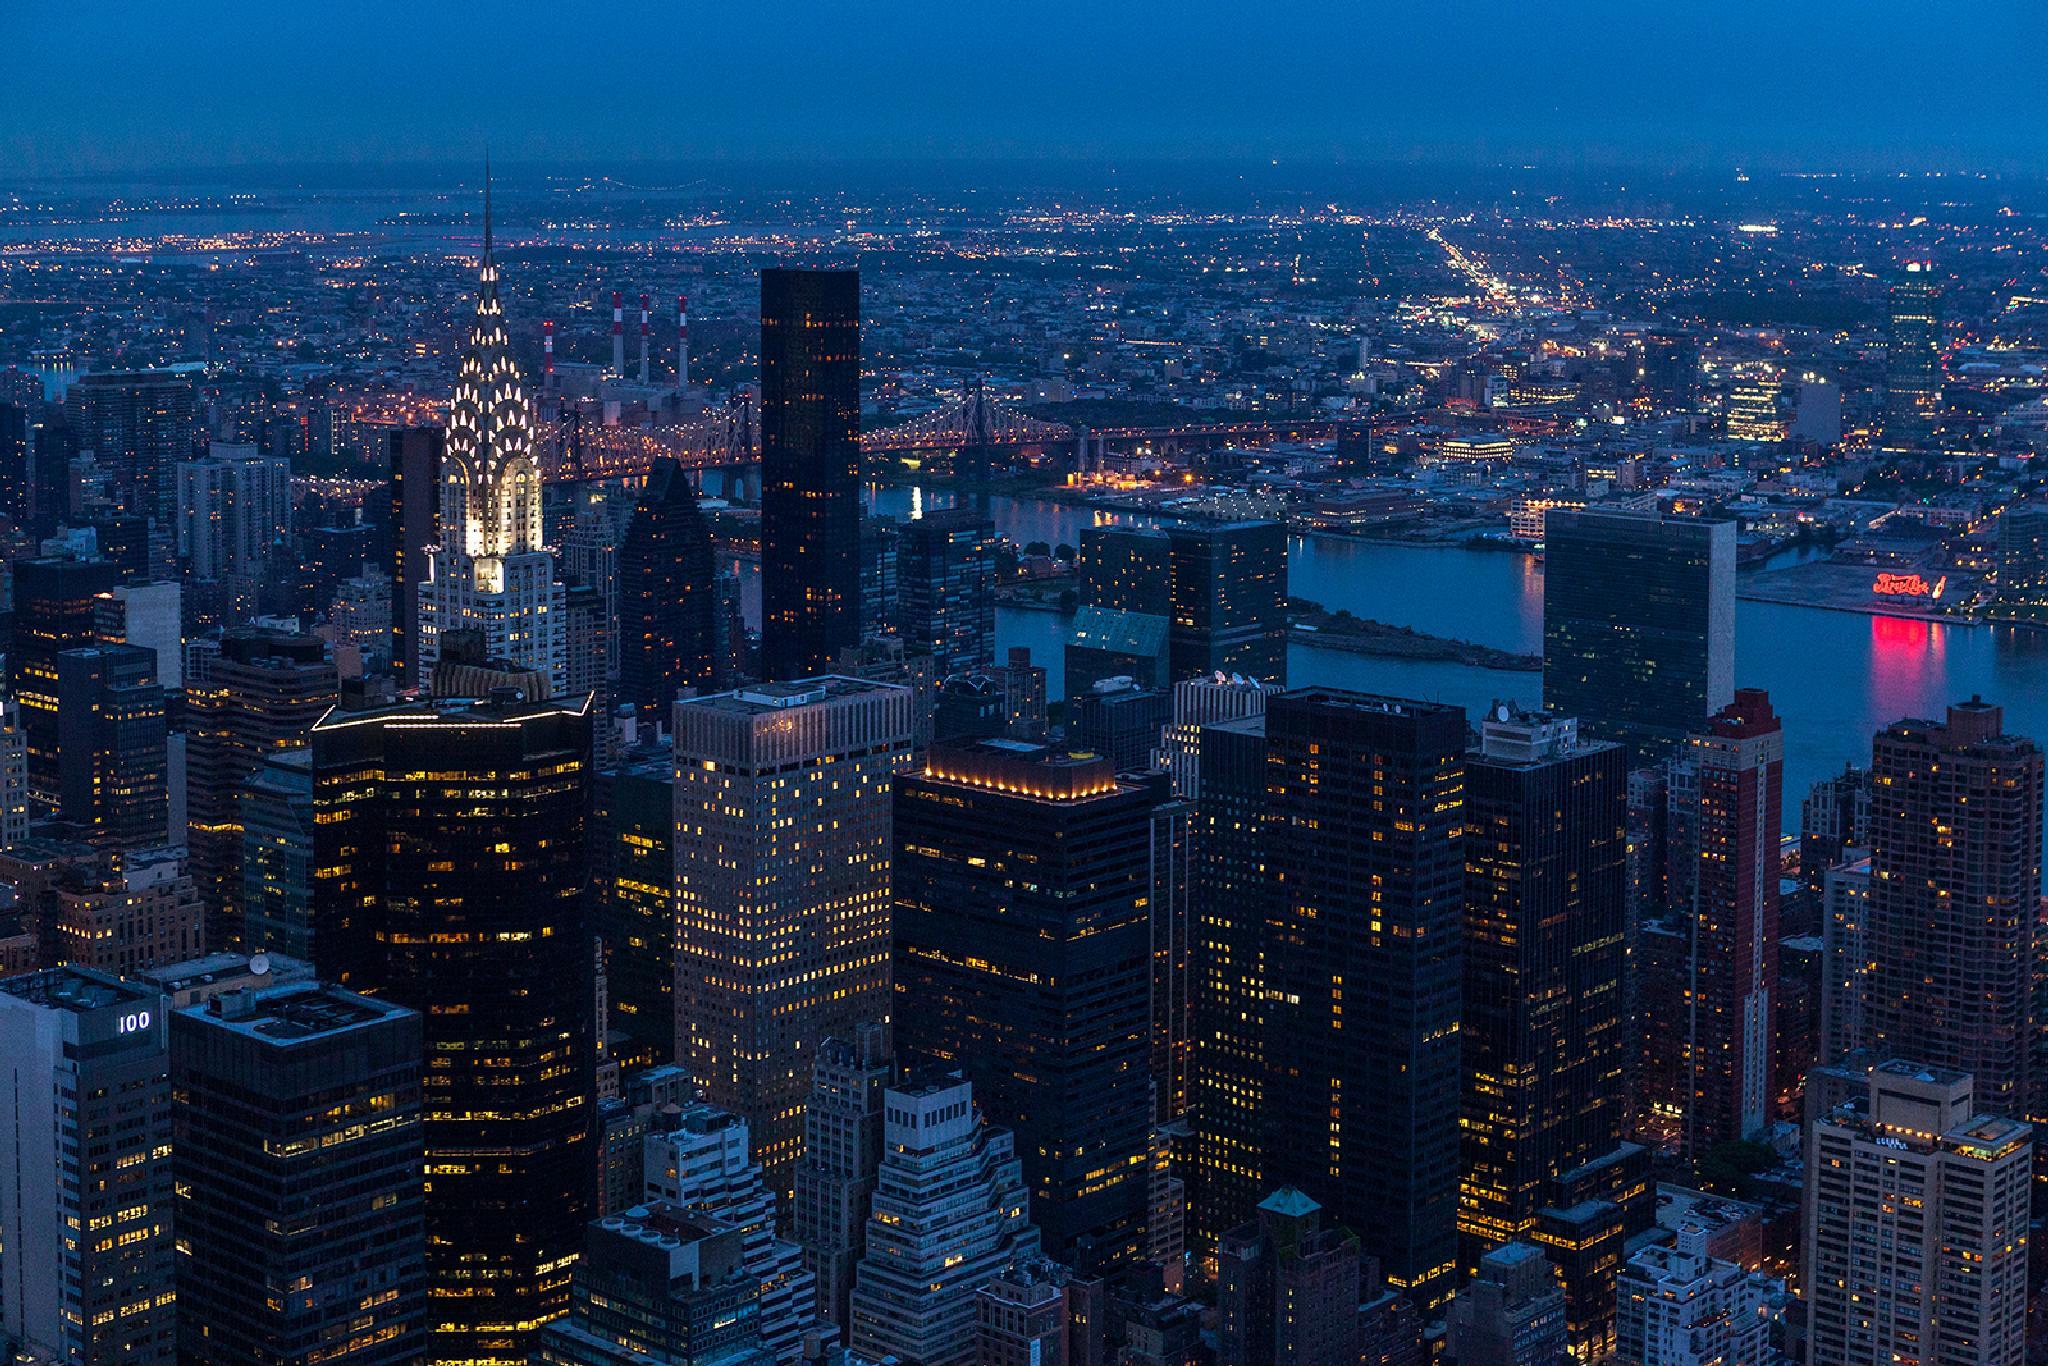 New York at night by Ana Gomez